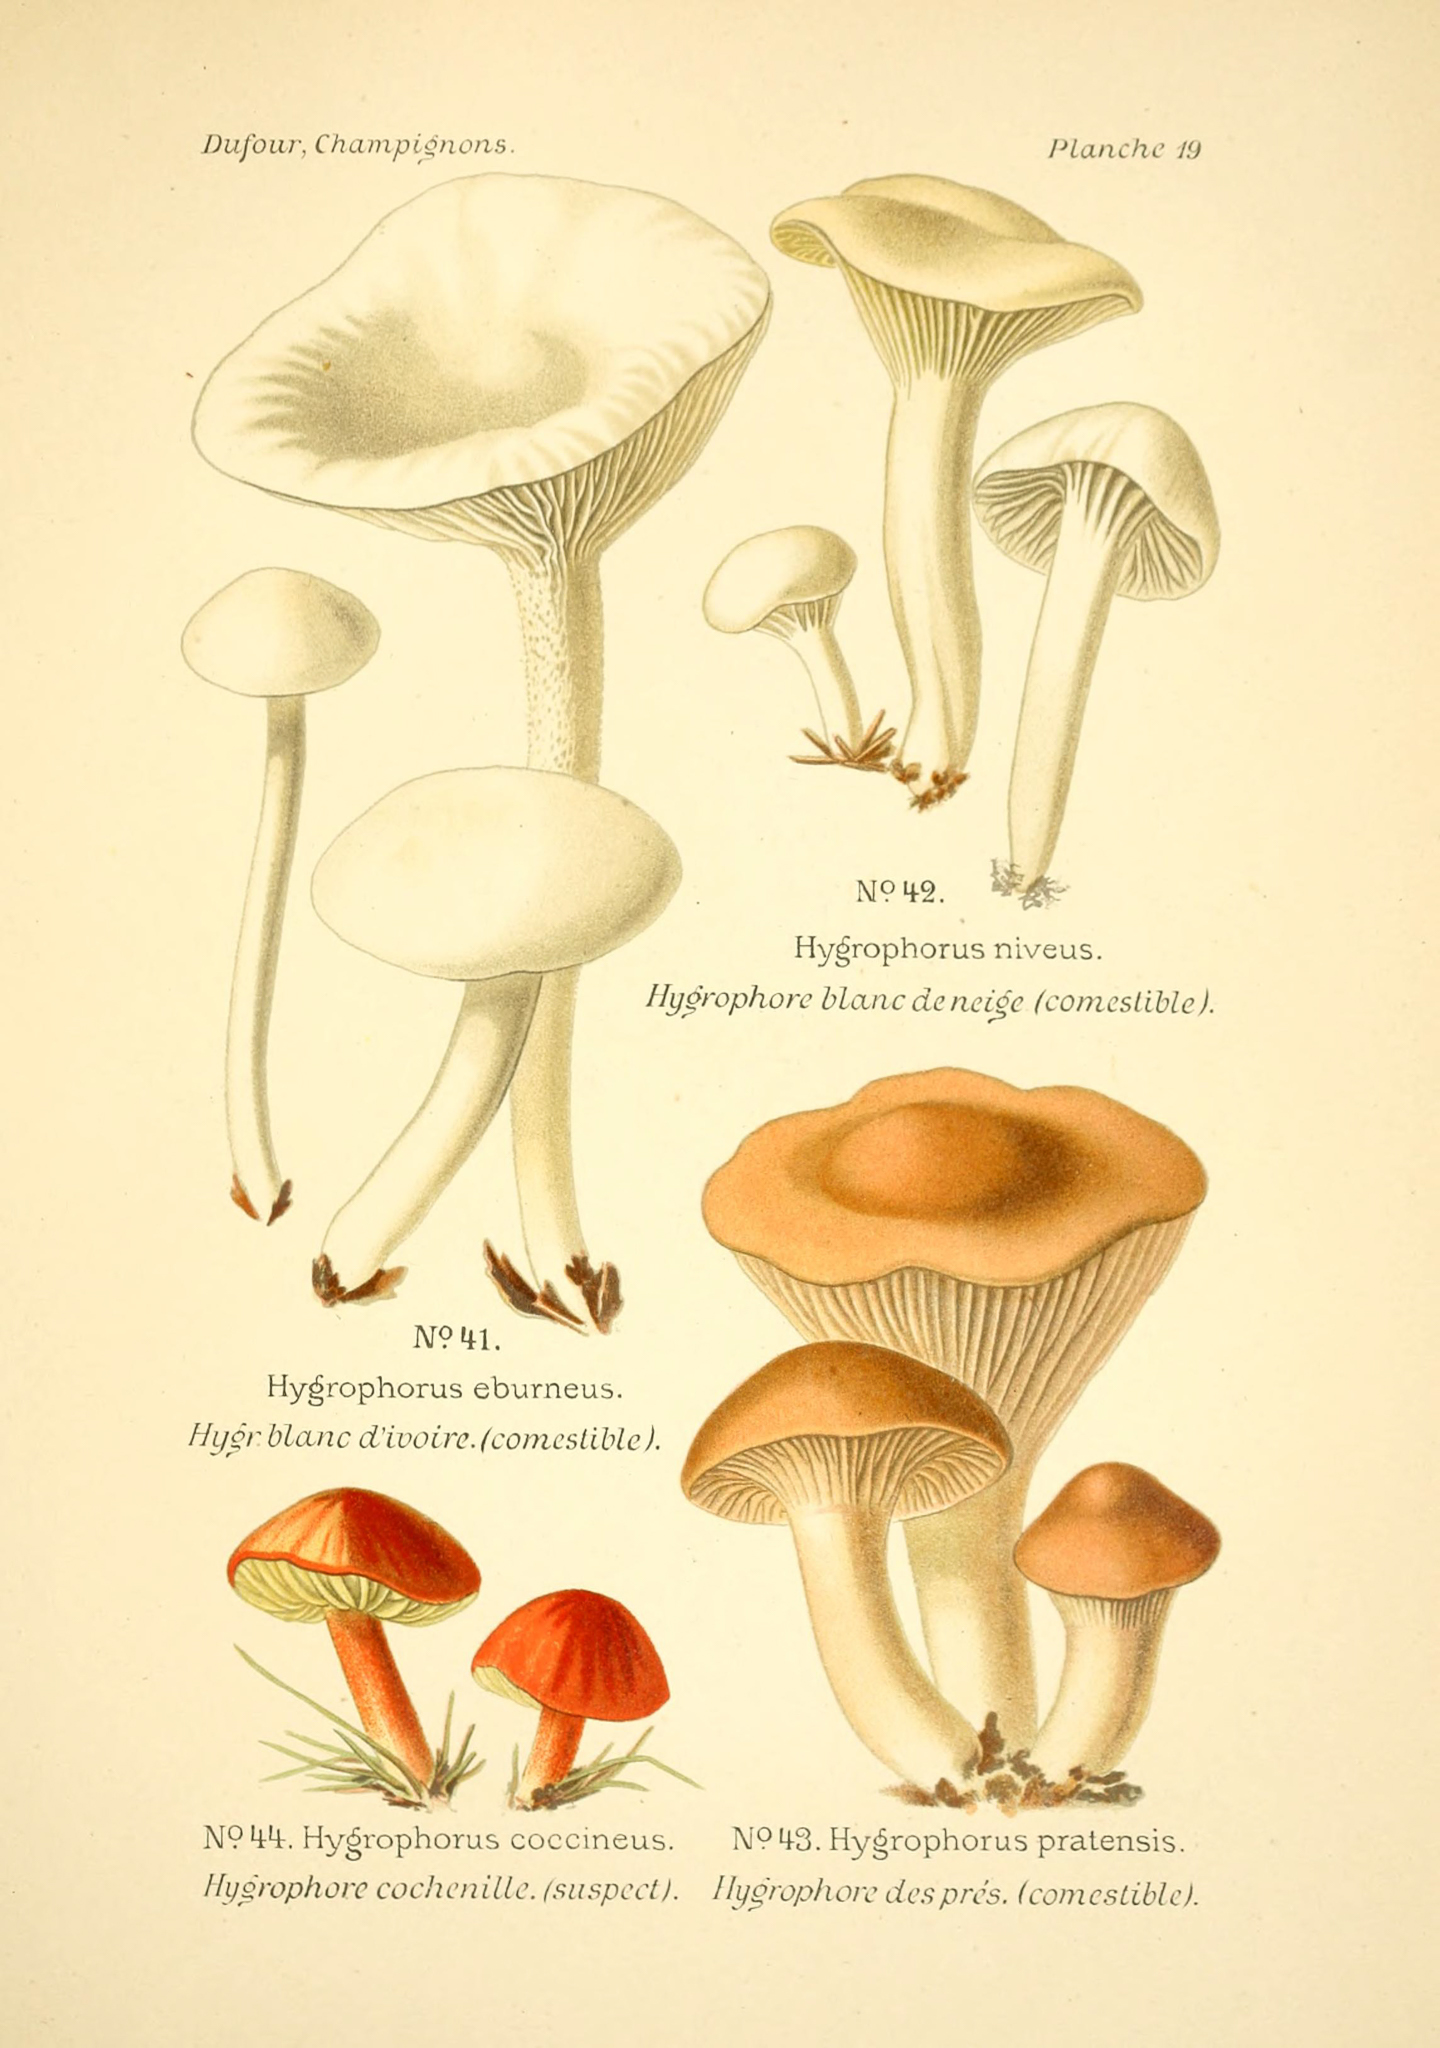 Hygrocybe pratensis - The Hall of Einar